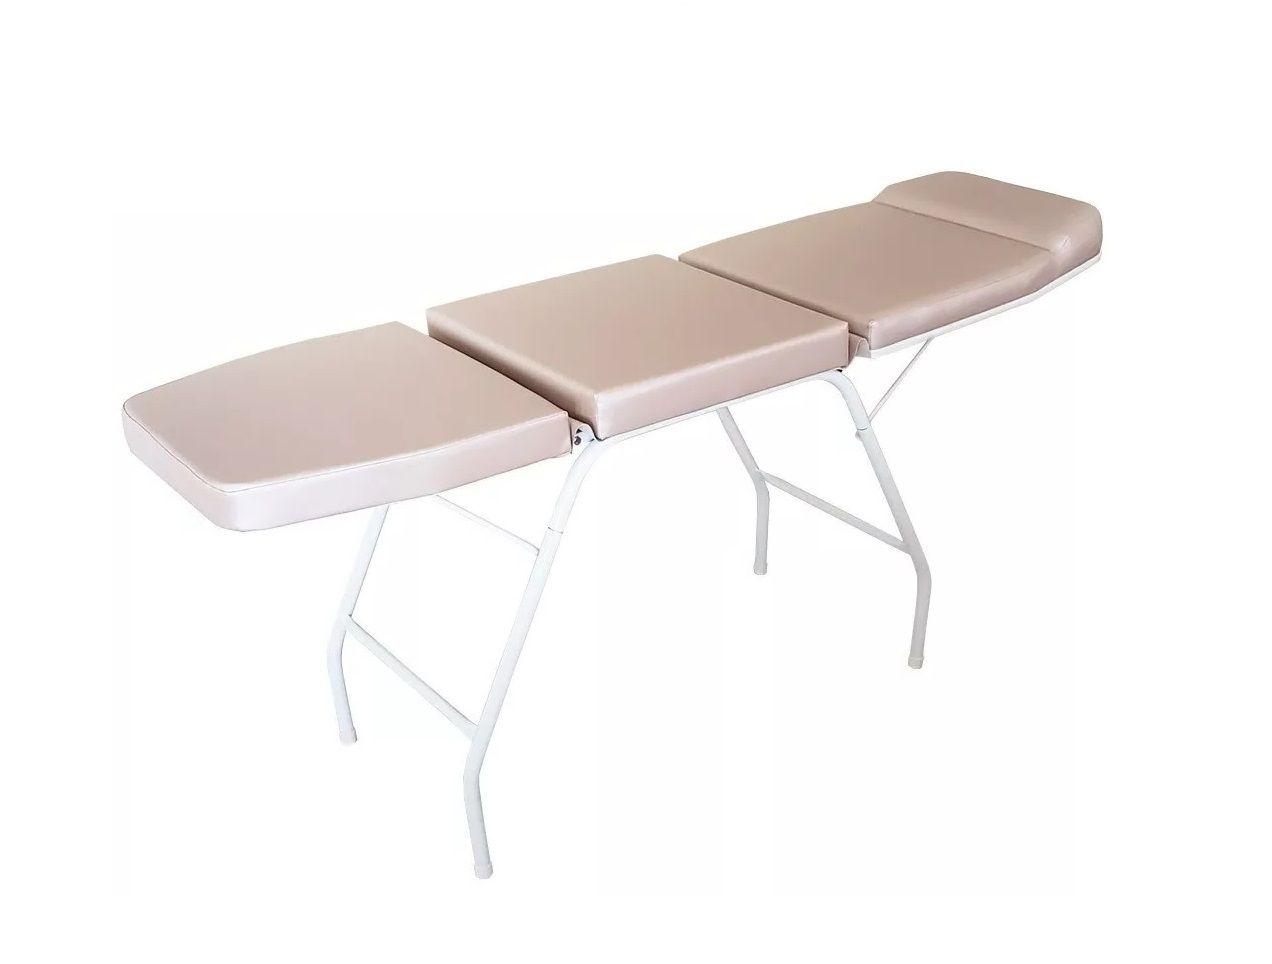 Kit Estética Poltrona Cadeira Mocho à Gás Escadinha Brinde